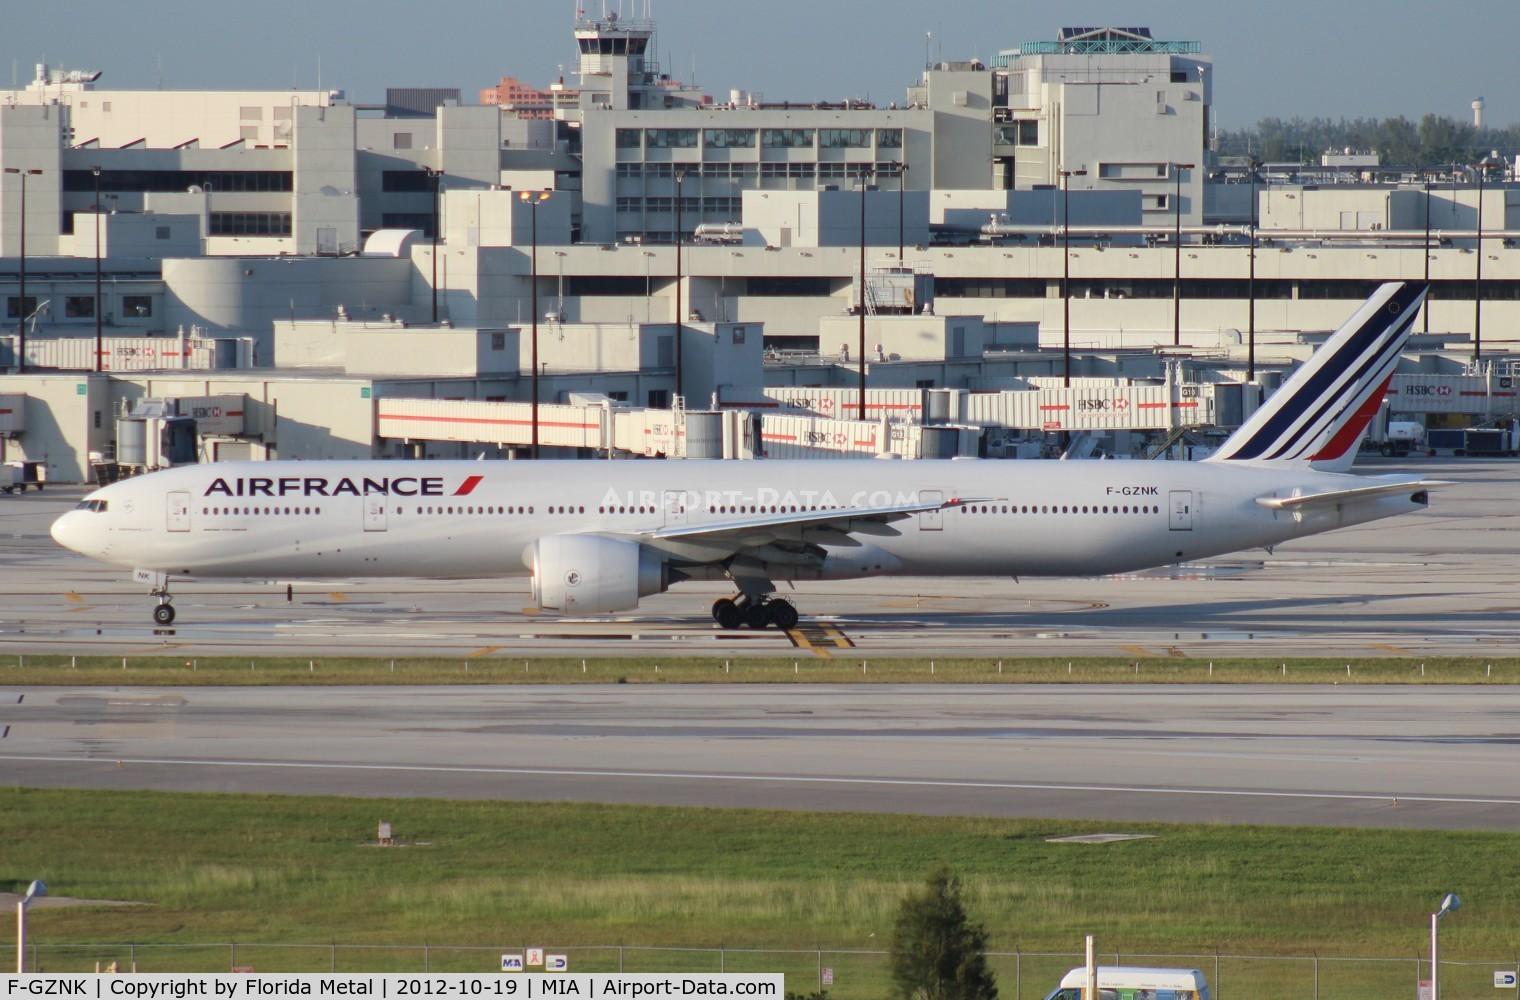 F-GZNK, 2011 Boeing 777-328/ER C/N 39971, Air France 777-300